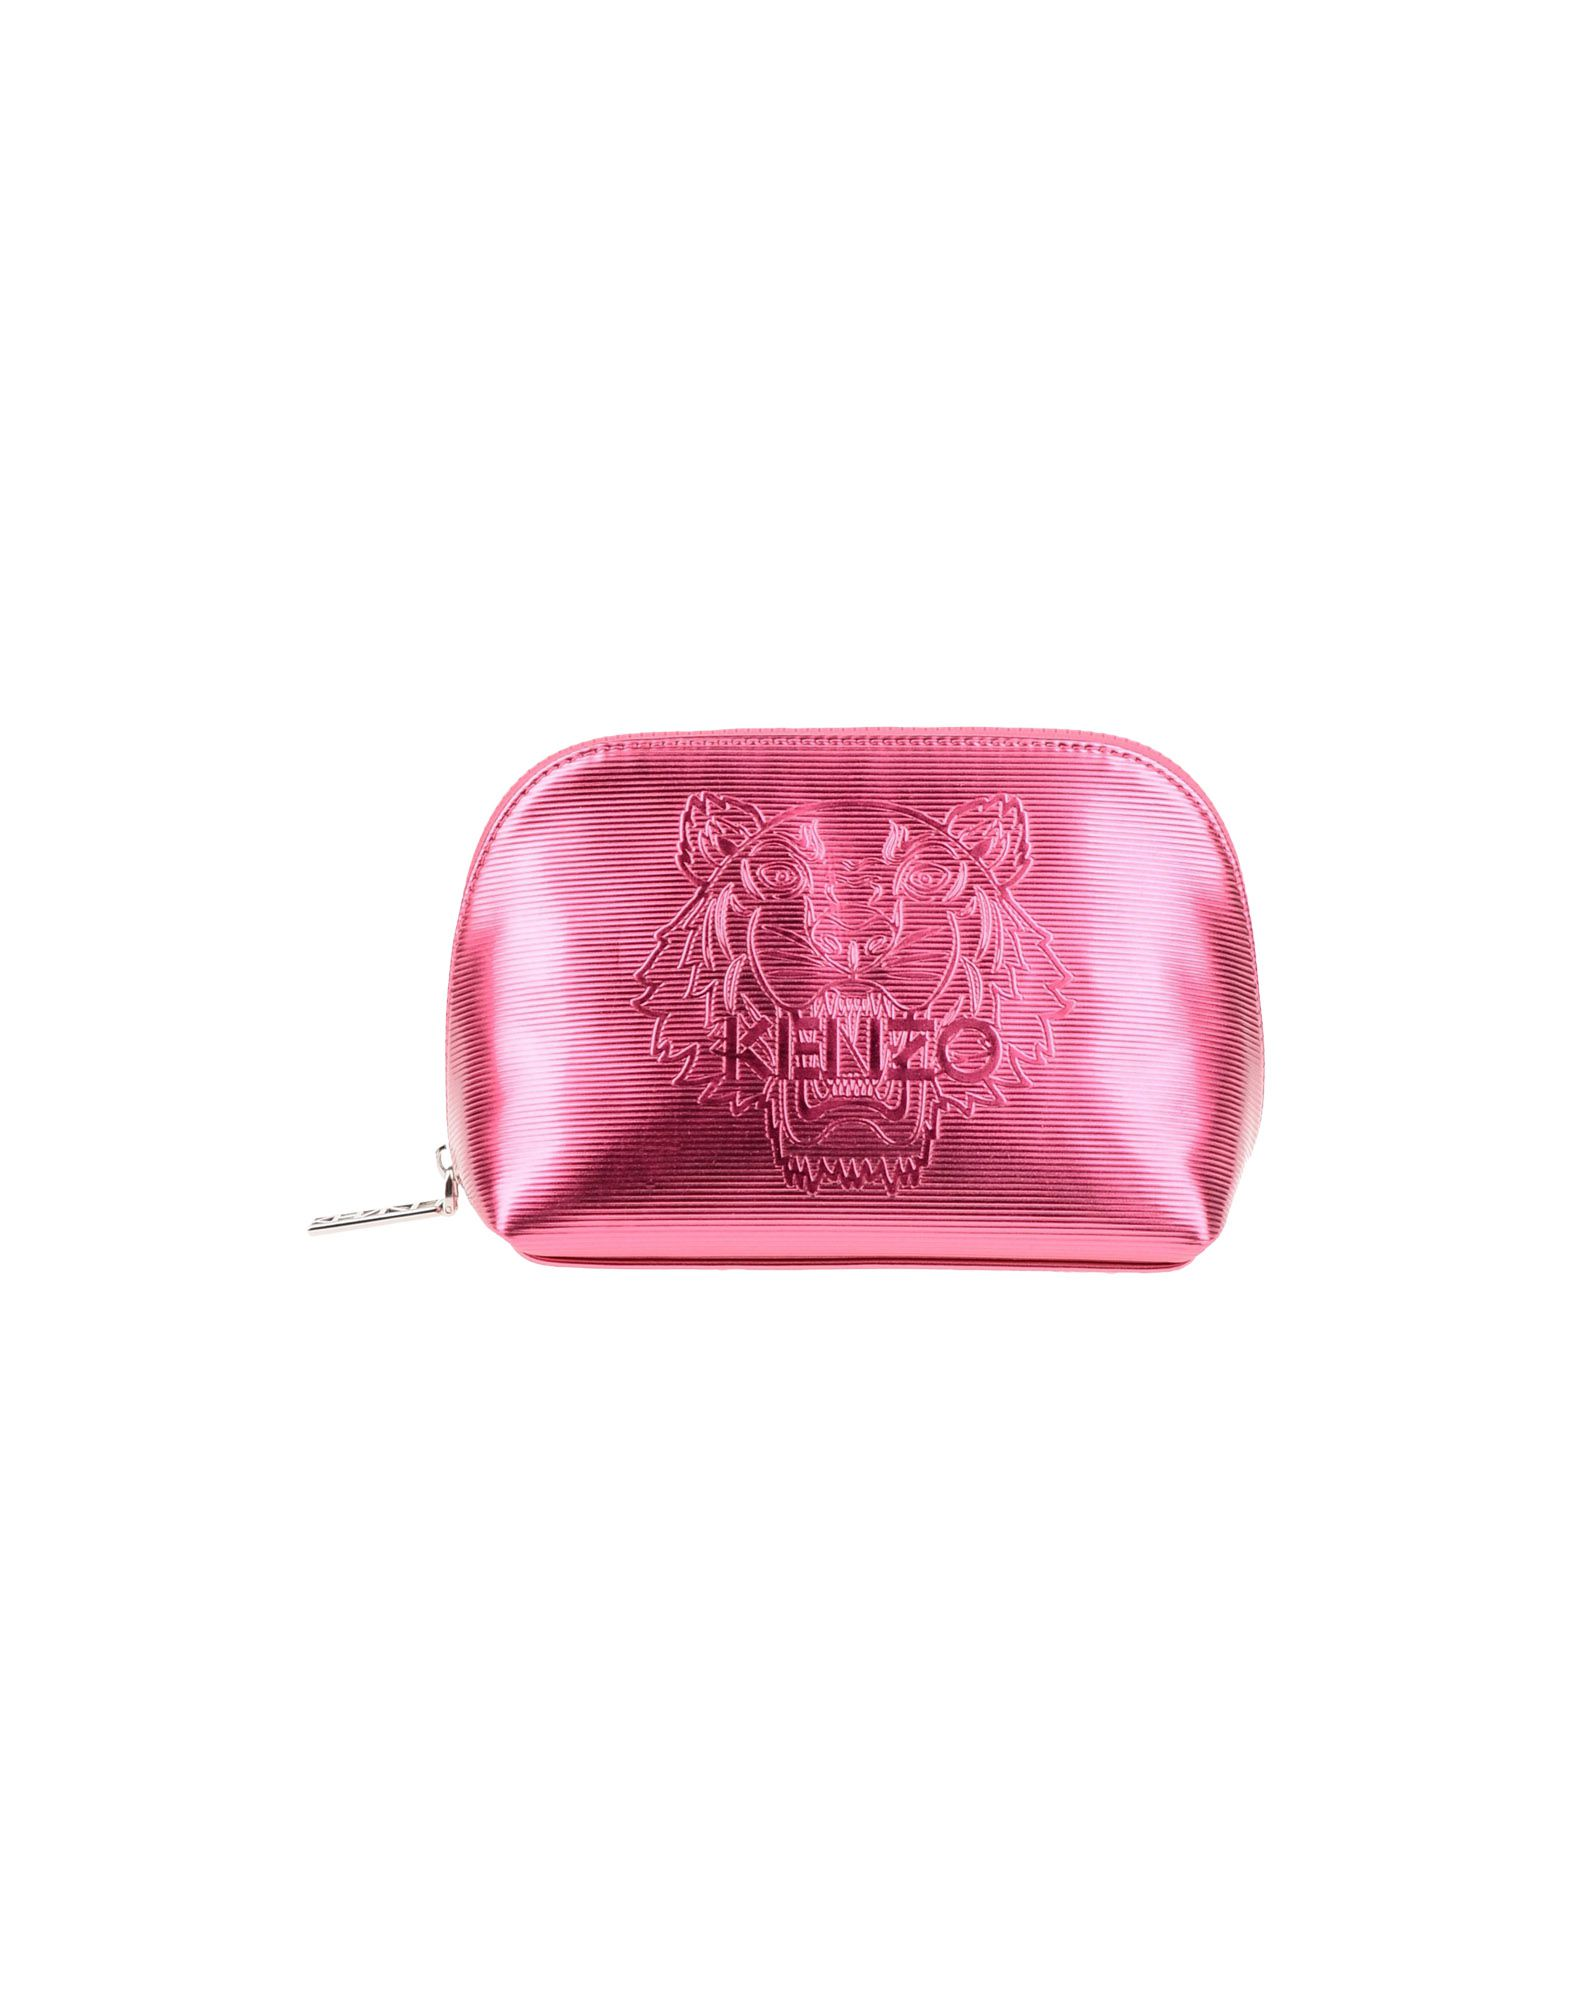 Beauty Case Kenzo Donna - Acquista online su